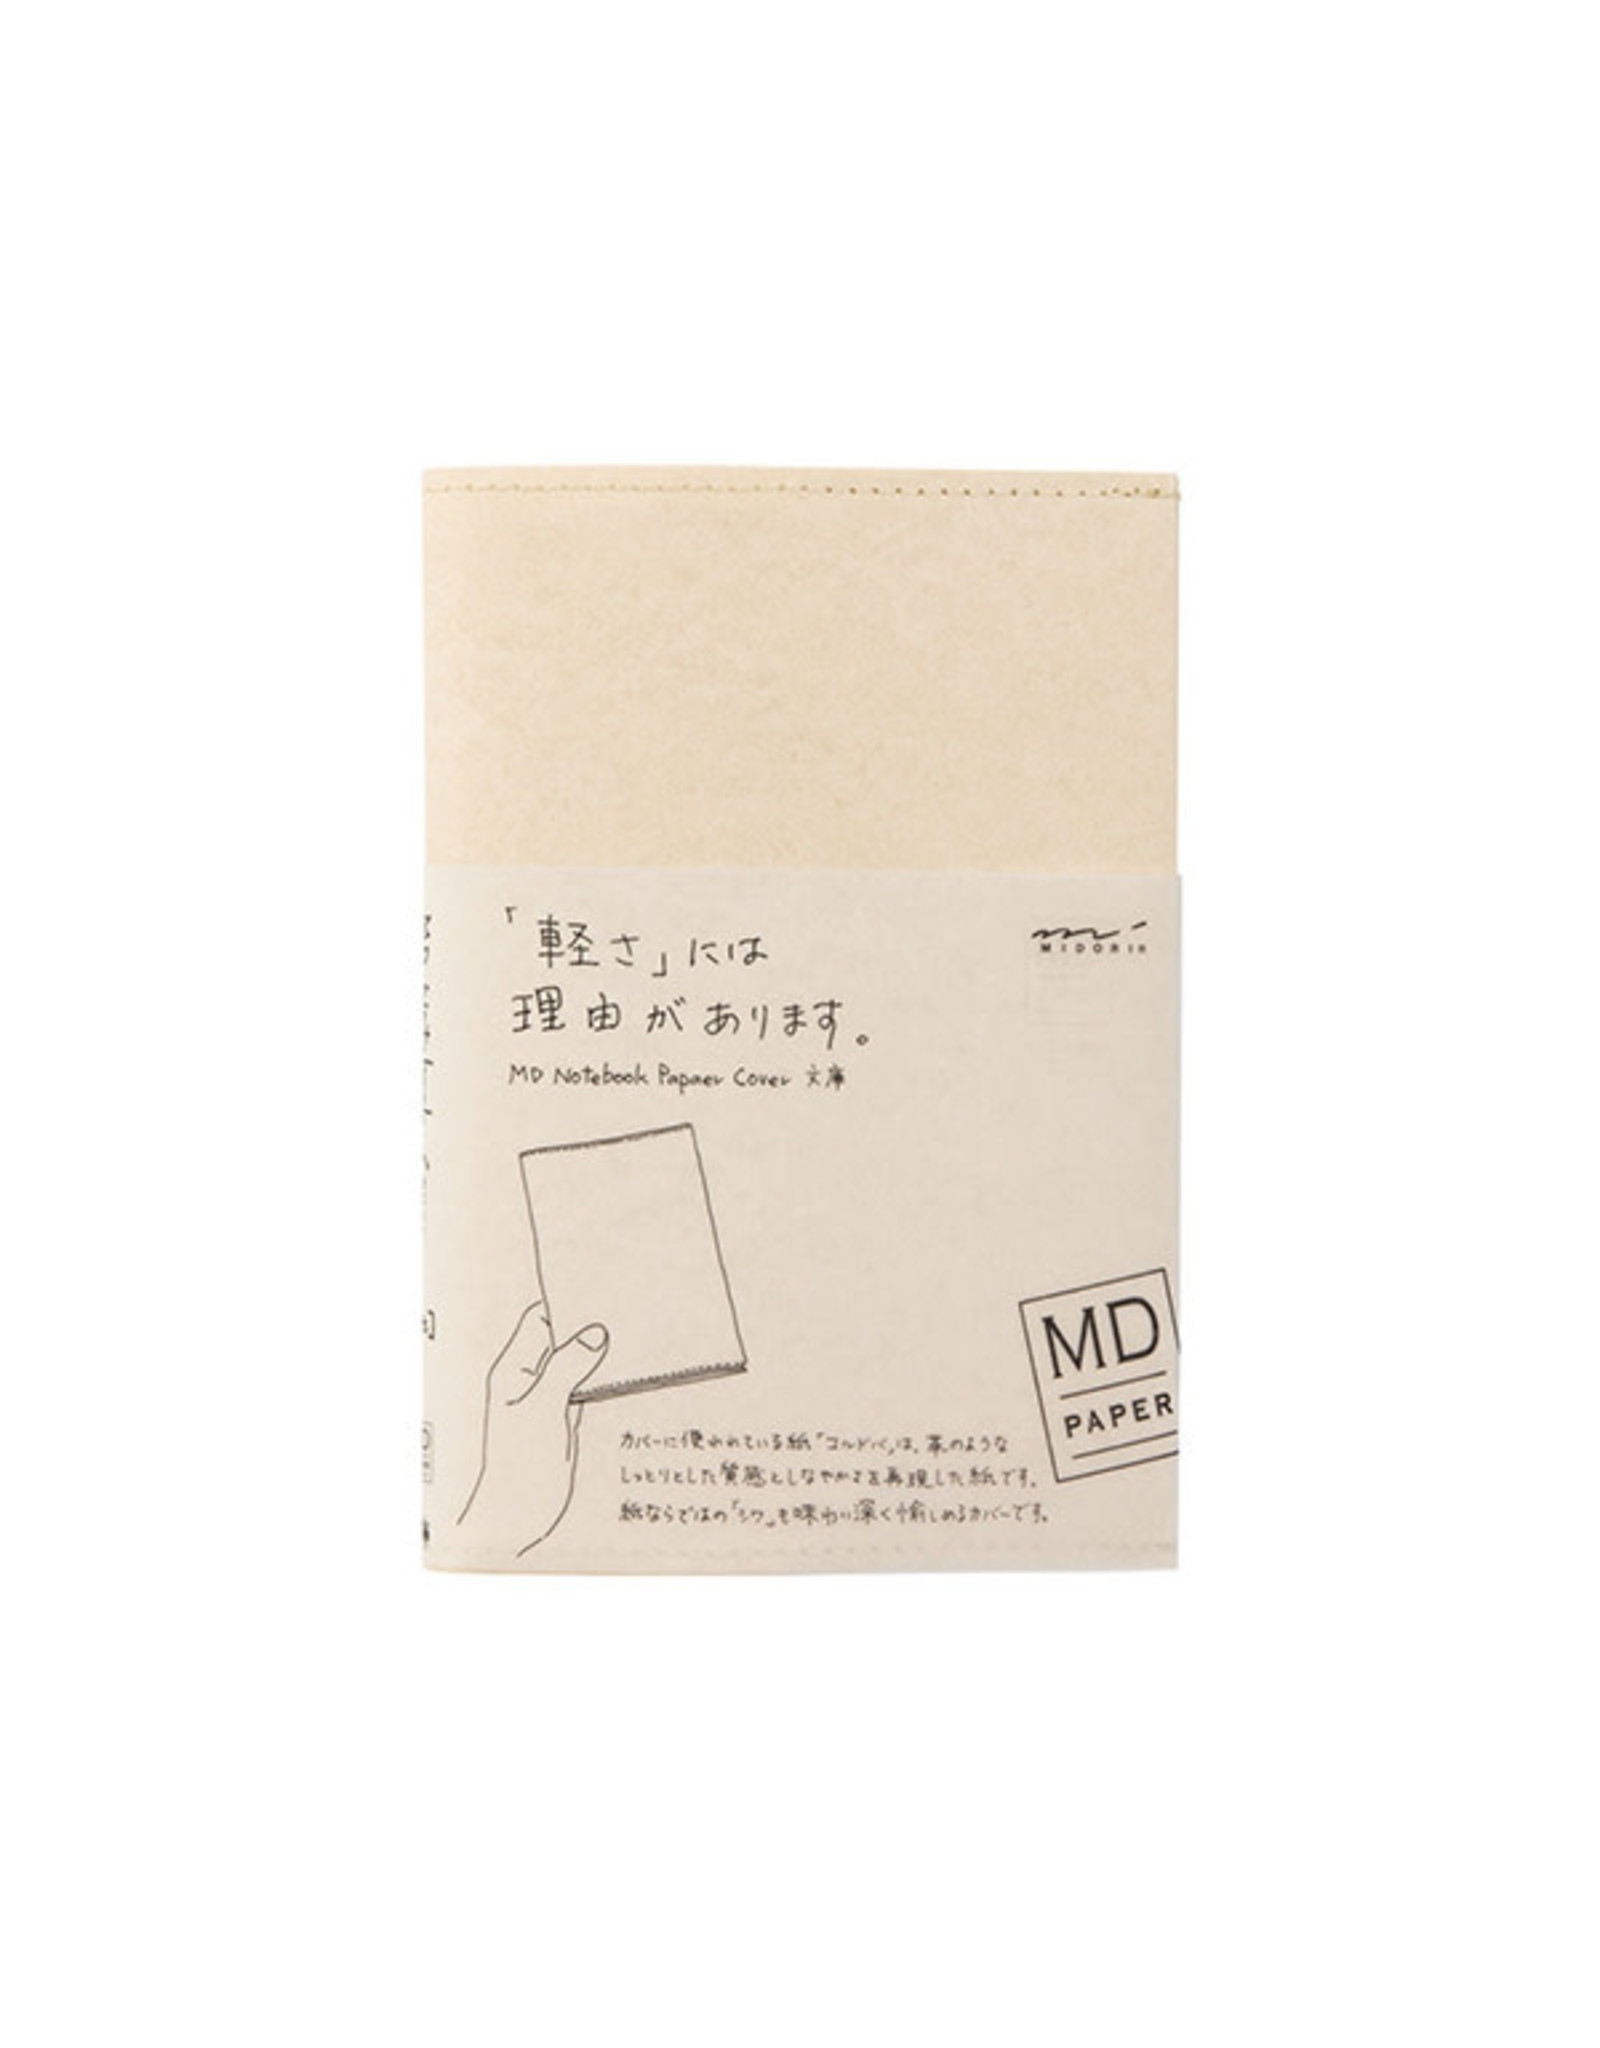 Designphil Inc. MD NOTEBOOK COVER [PAPER] BUNKO